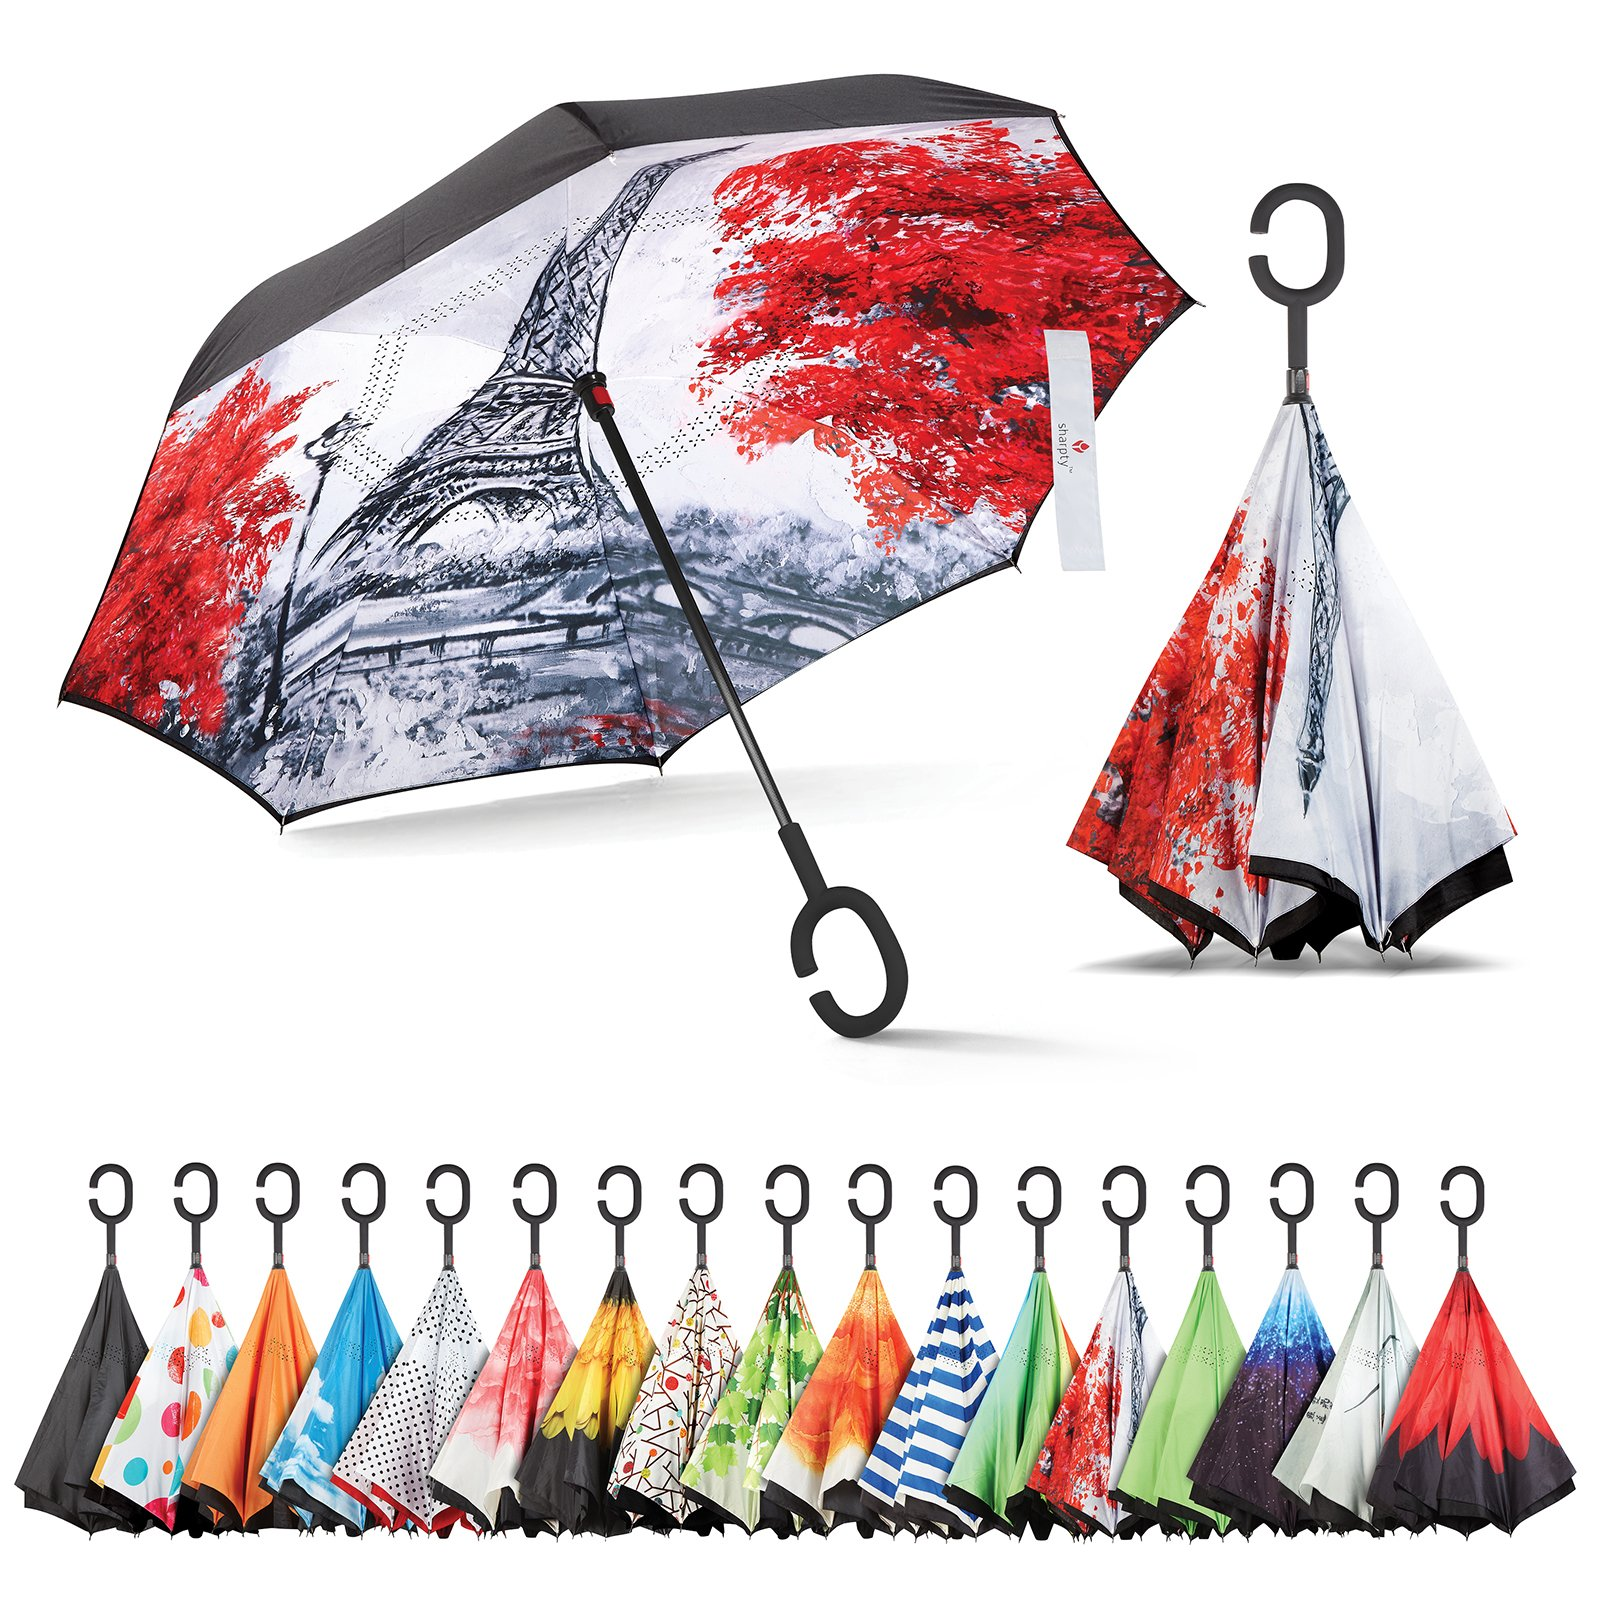 Inverted Umbrella, Best Windproof Umbrella, Cars Reverse Umbrella, Beautiful Rain Umbrella with UV Protection, Upside Down Umbrella with C-Shaped Handle and Carrying Bag (Green Shade)